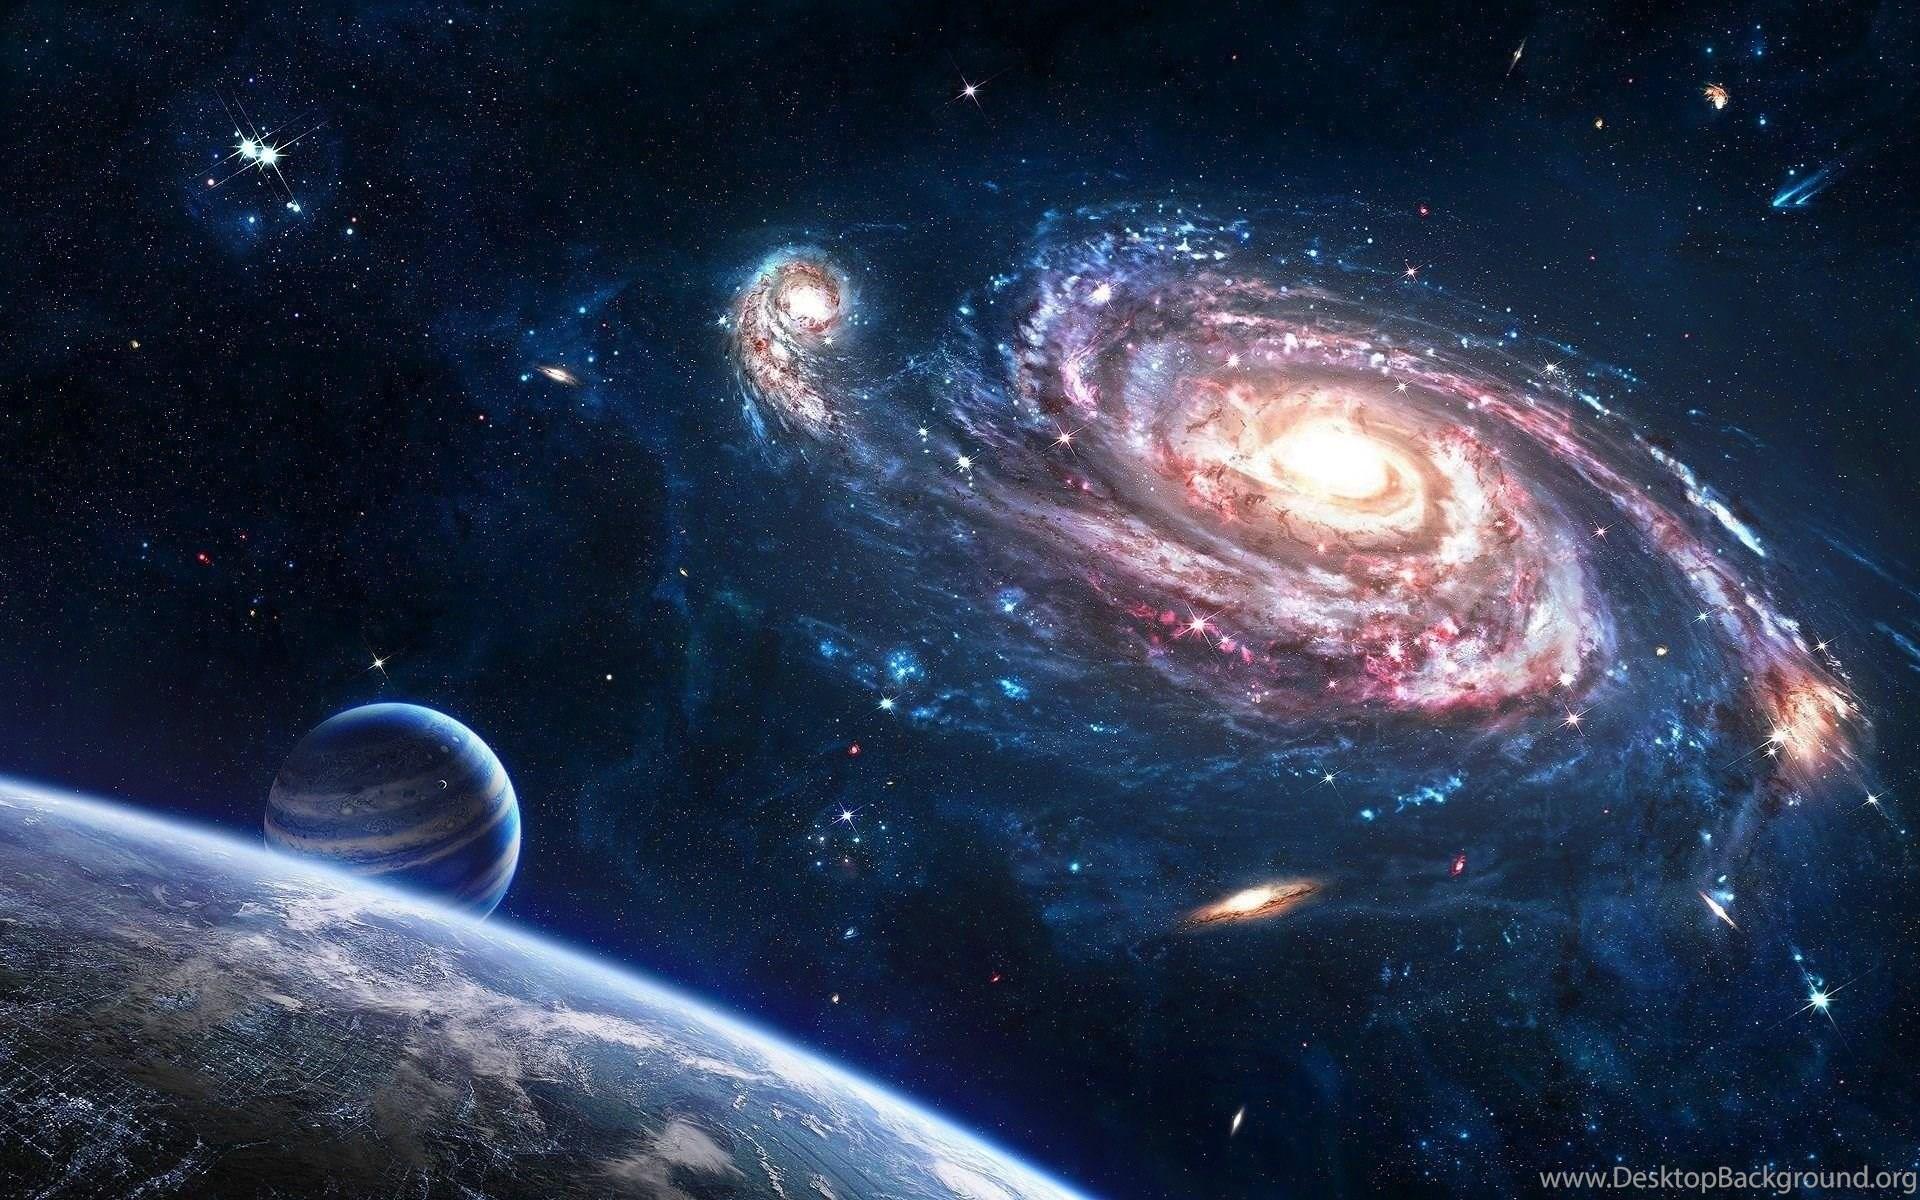 stars and galaxies wallpapers hd download of galaxy stars desktop